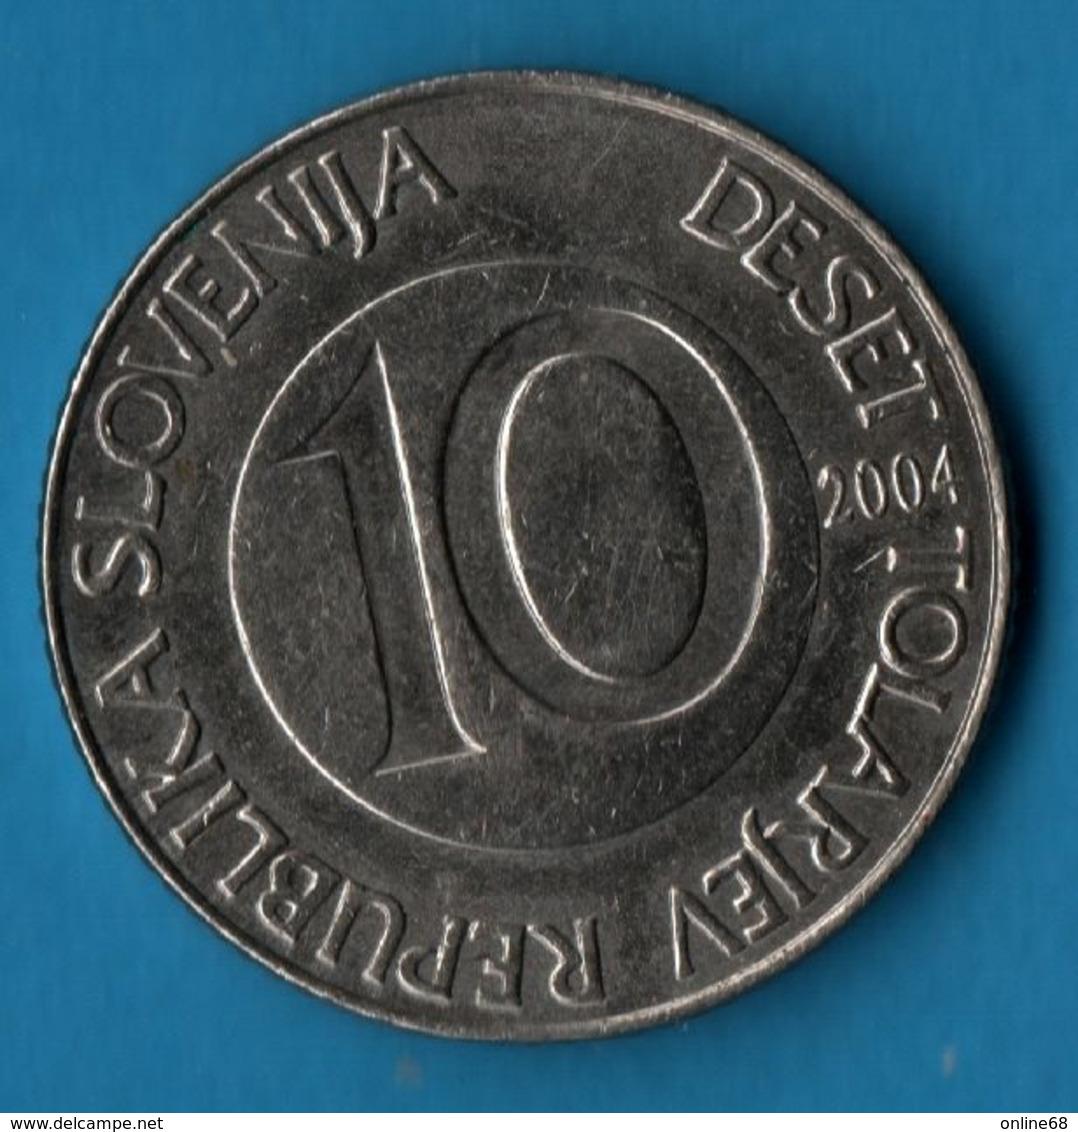 SLOVENIA 10 TOLARJEV 2004   KM# 41 EQUUS - Slovenia